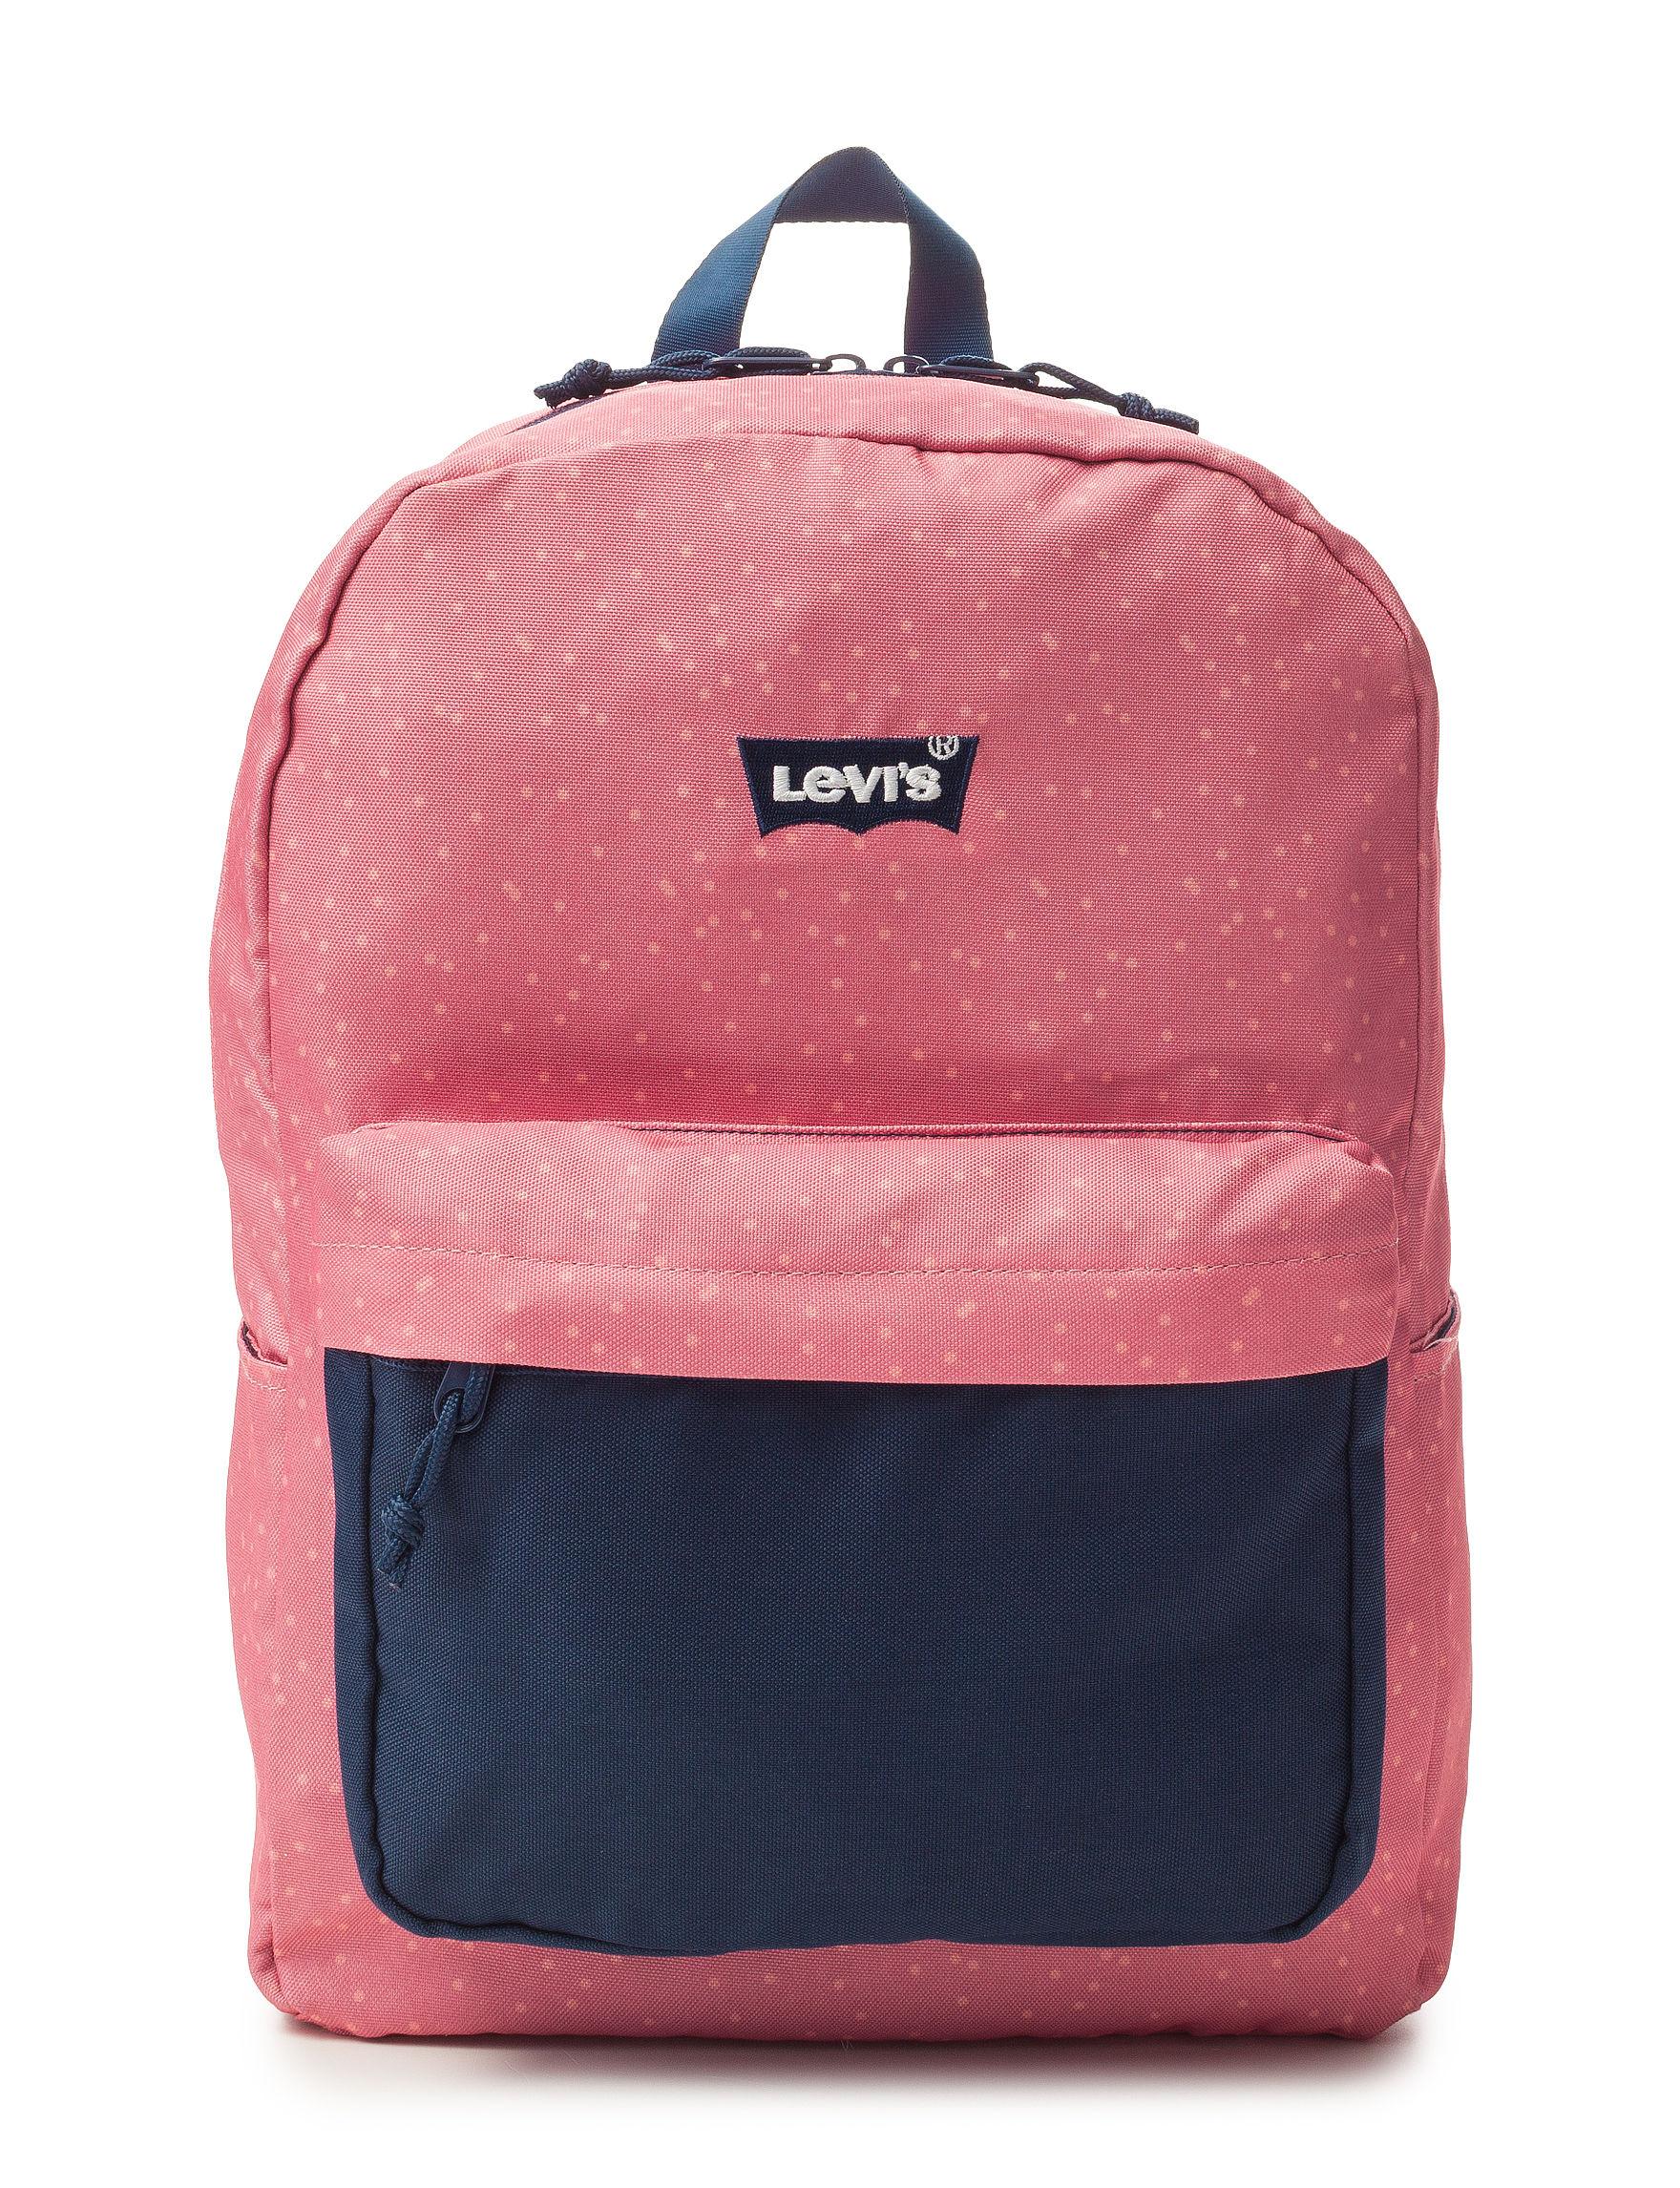 Levi's Blush Bookbags & Backpacks